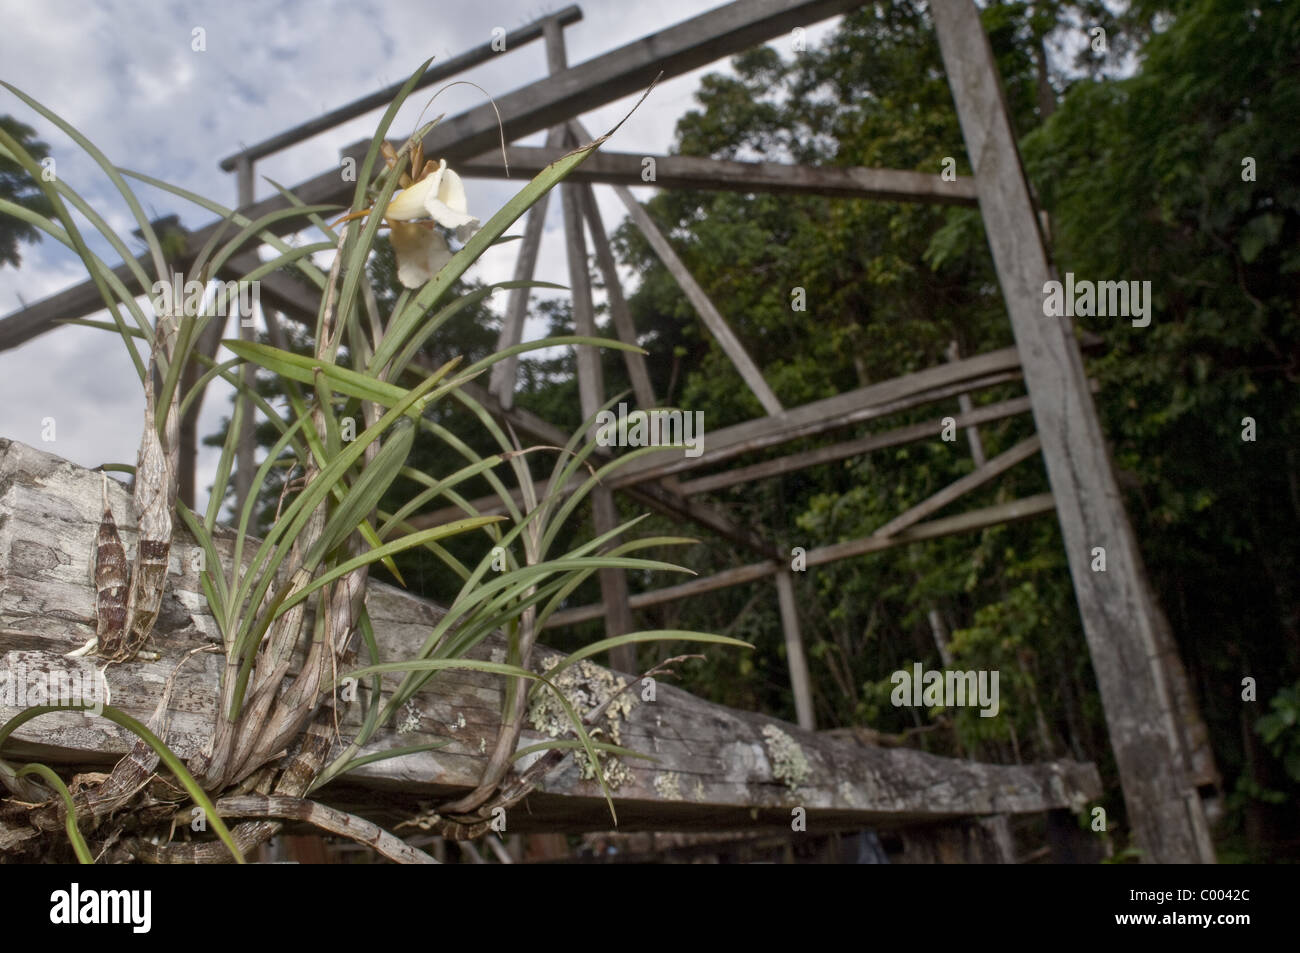 Beautiful plant life in the Amazon region of Ecuador. - Stock Image